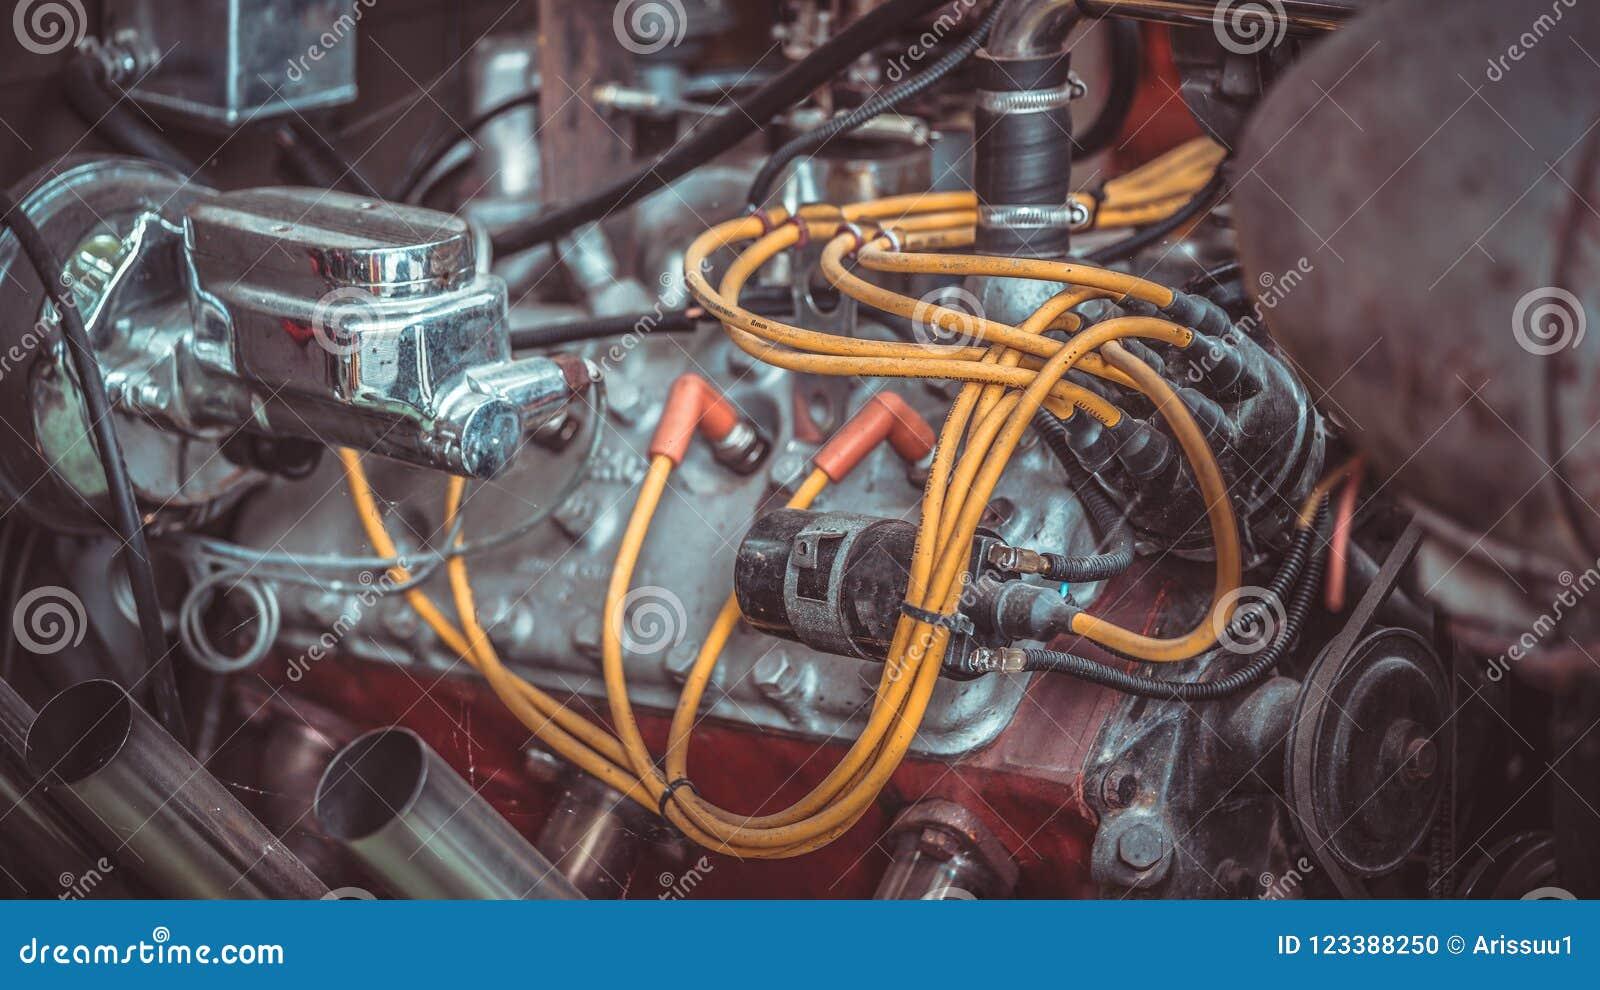 Industrielles mechanische Energie-Maschinen-Gerät